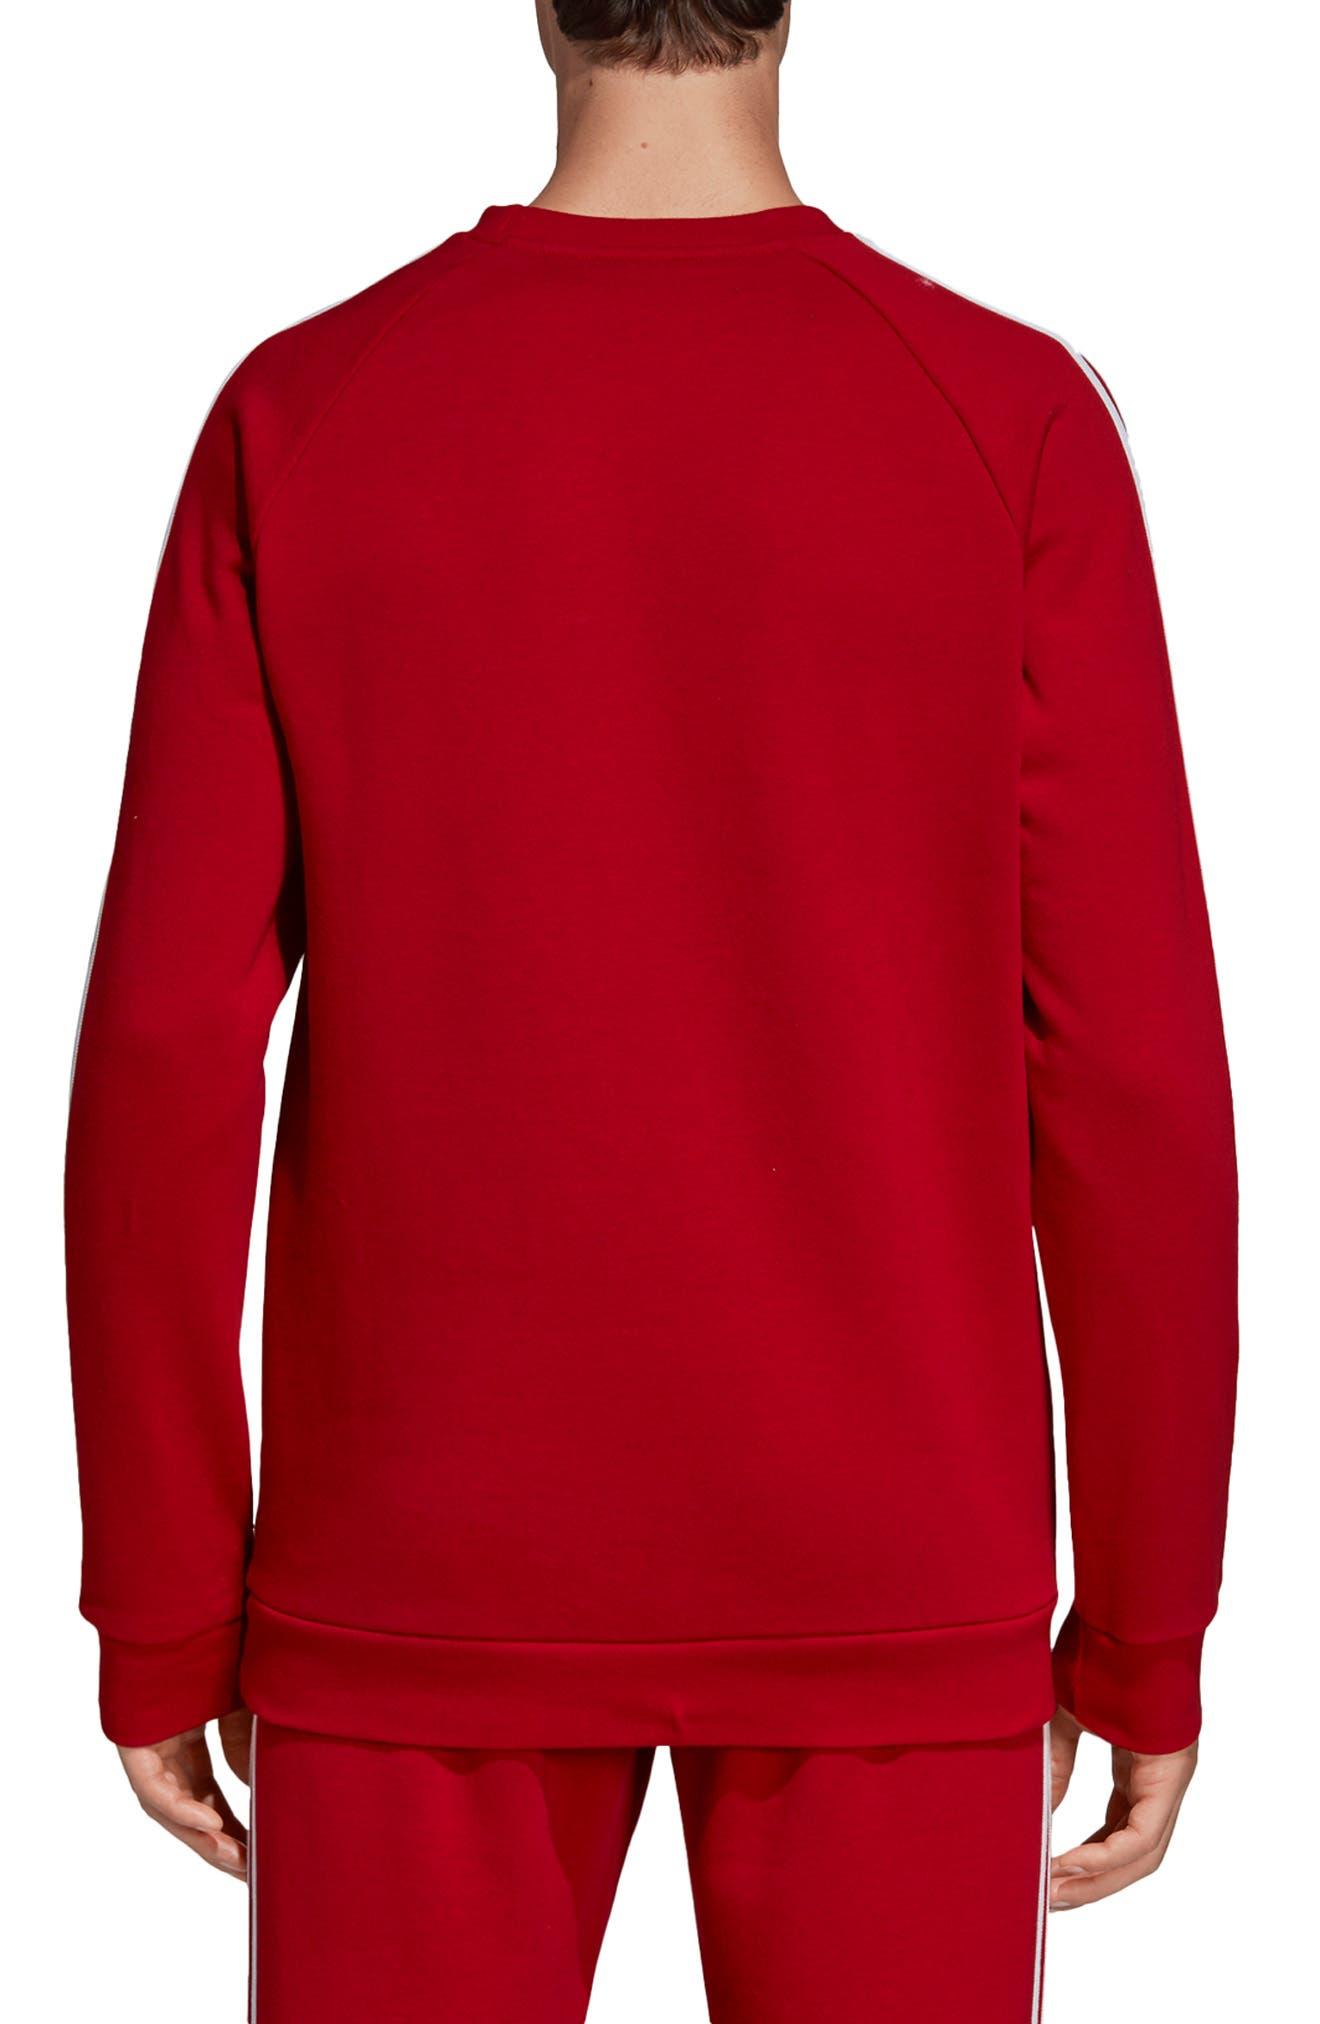 ADIDAS ORIGINALS, 3-Stripes Raglan Sweatshirt, Alternate thumbnail 2, color, POWER RED